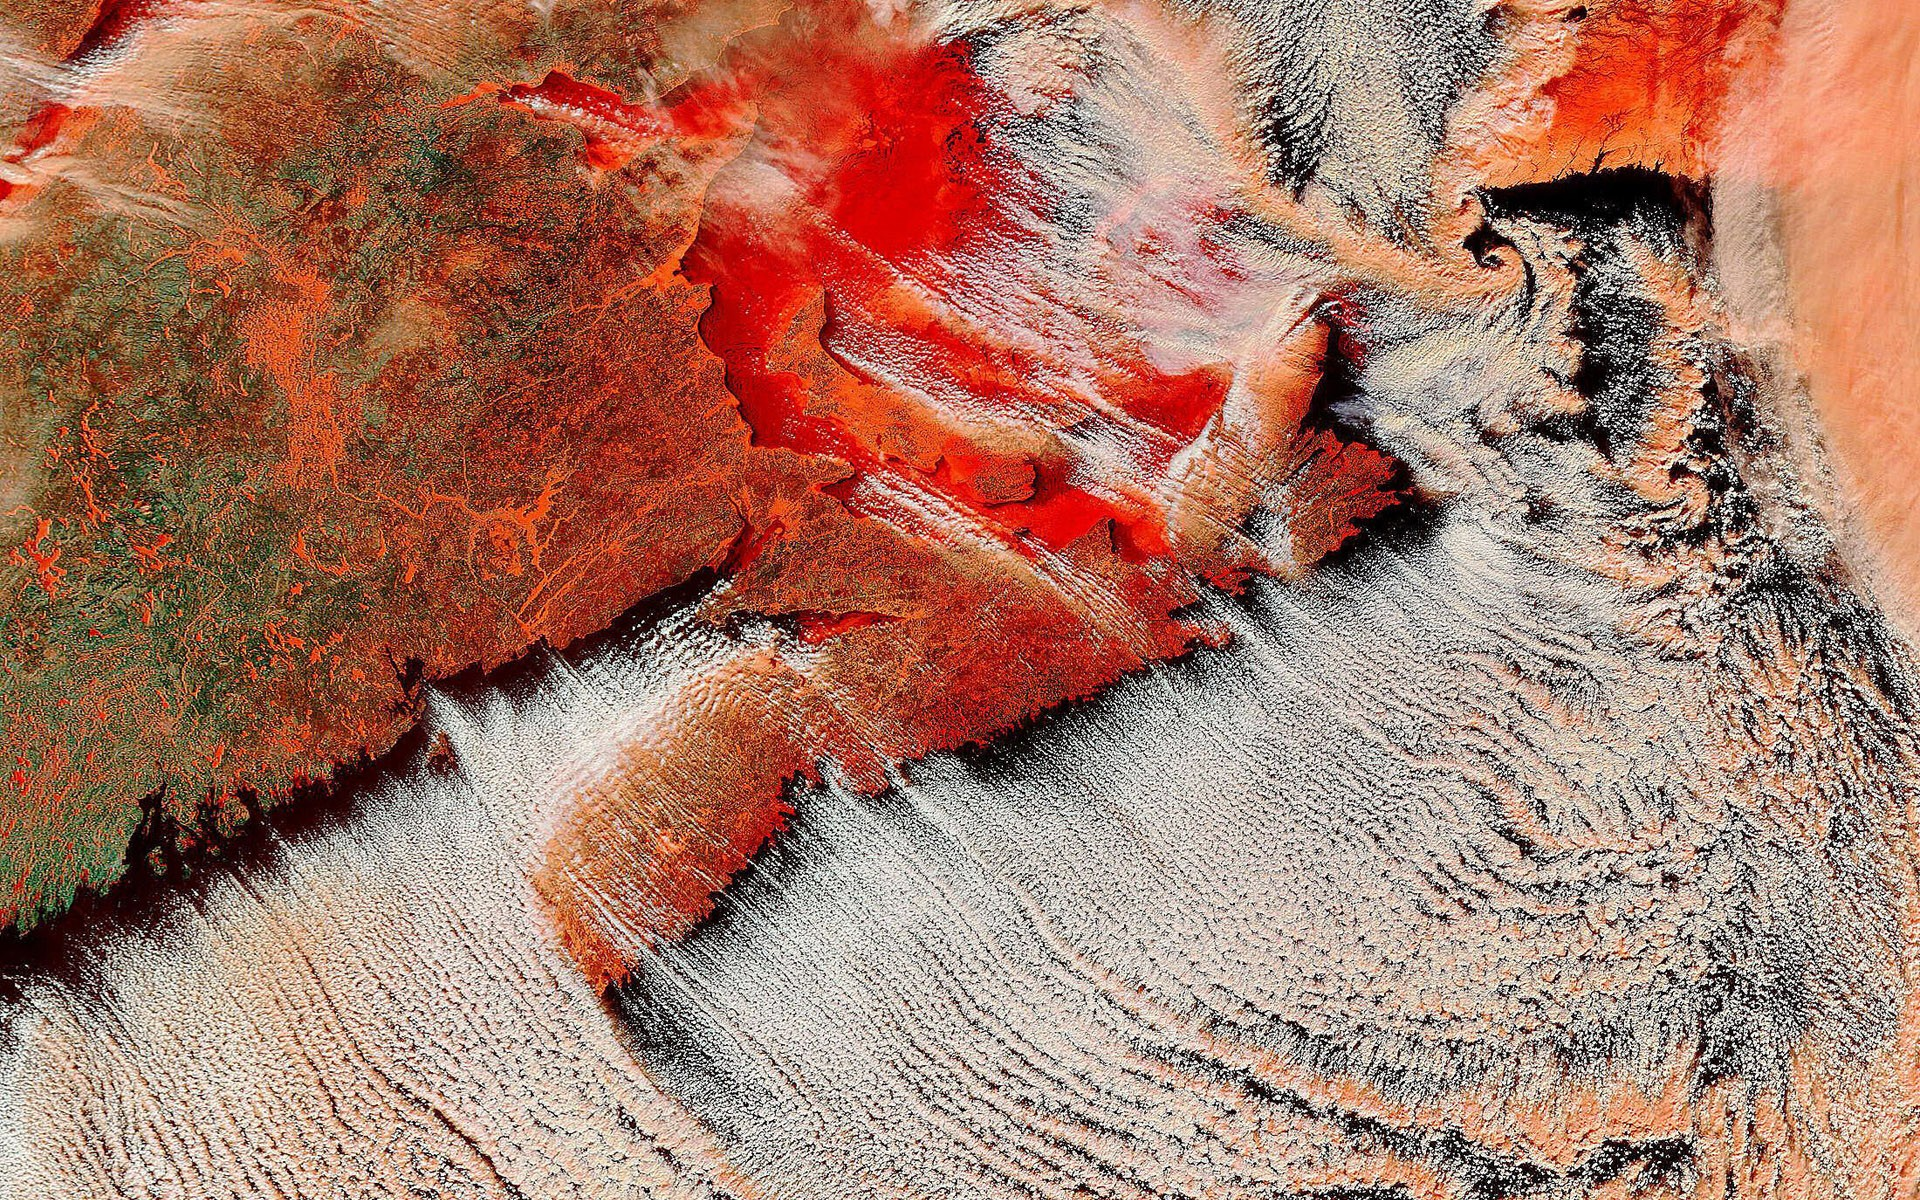 Vista Satélite de la Tierra - 1920x1200